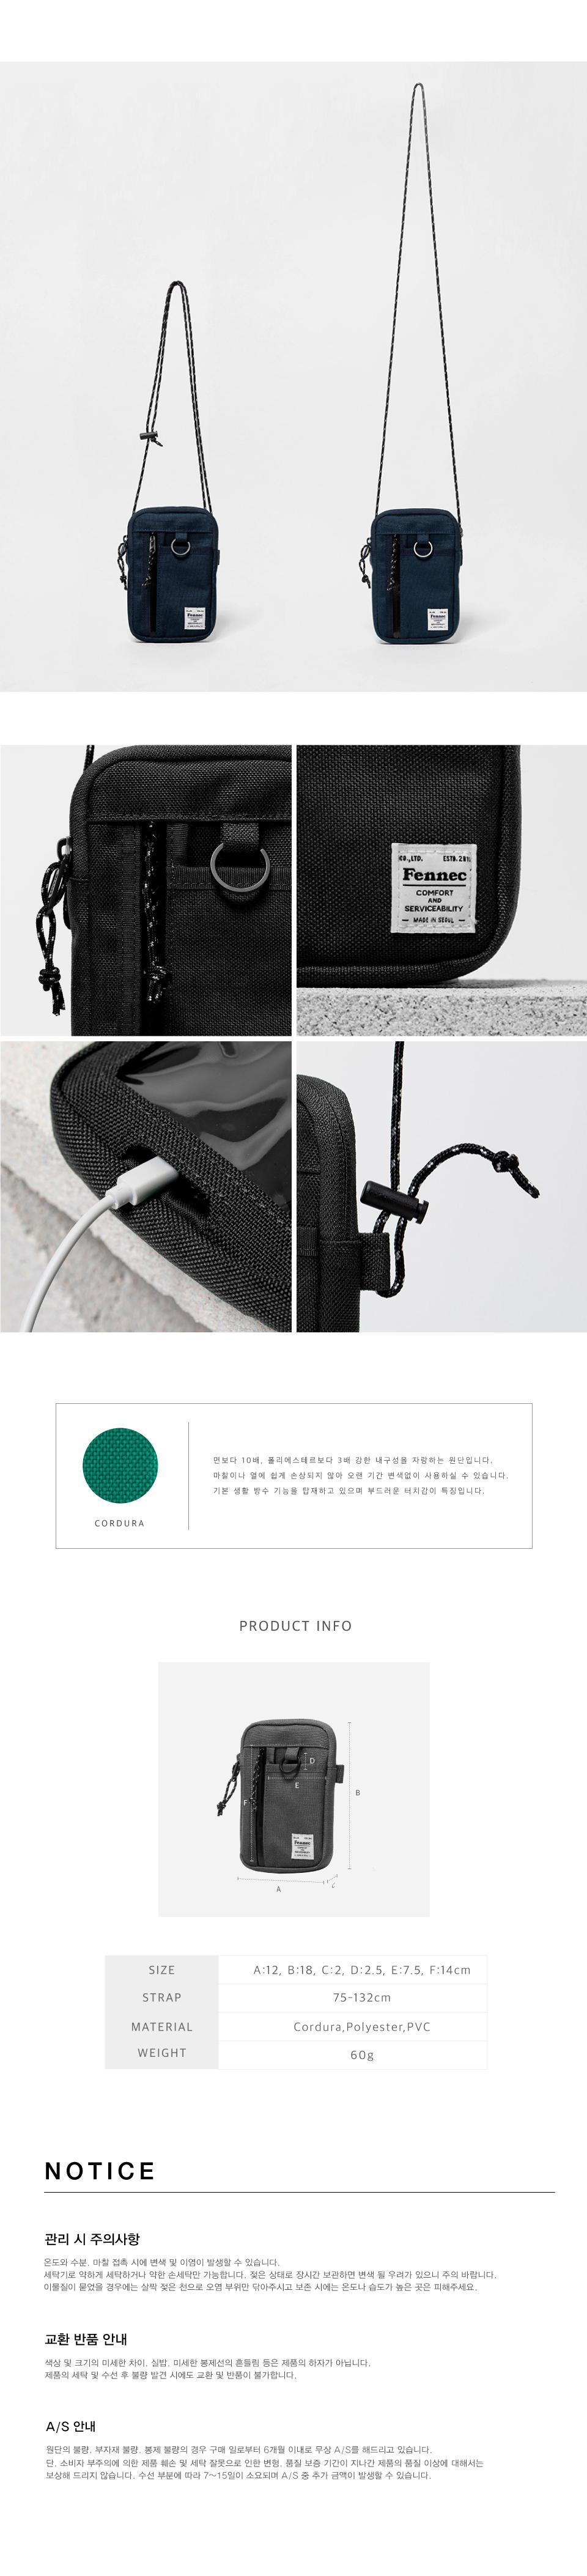 C_S-micro-bag-nv2.jpg